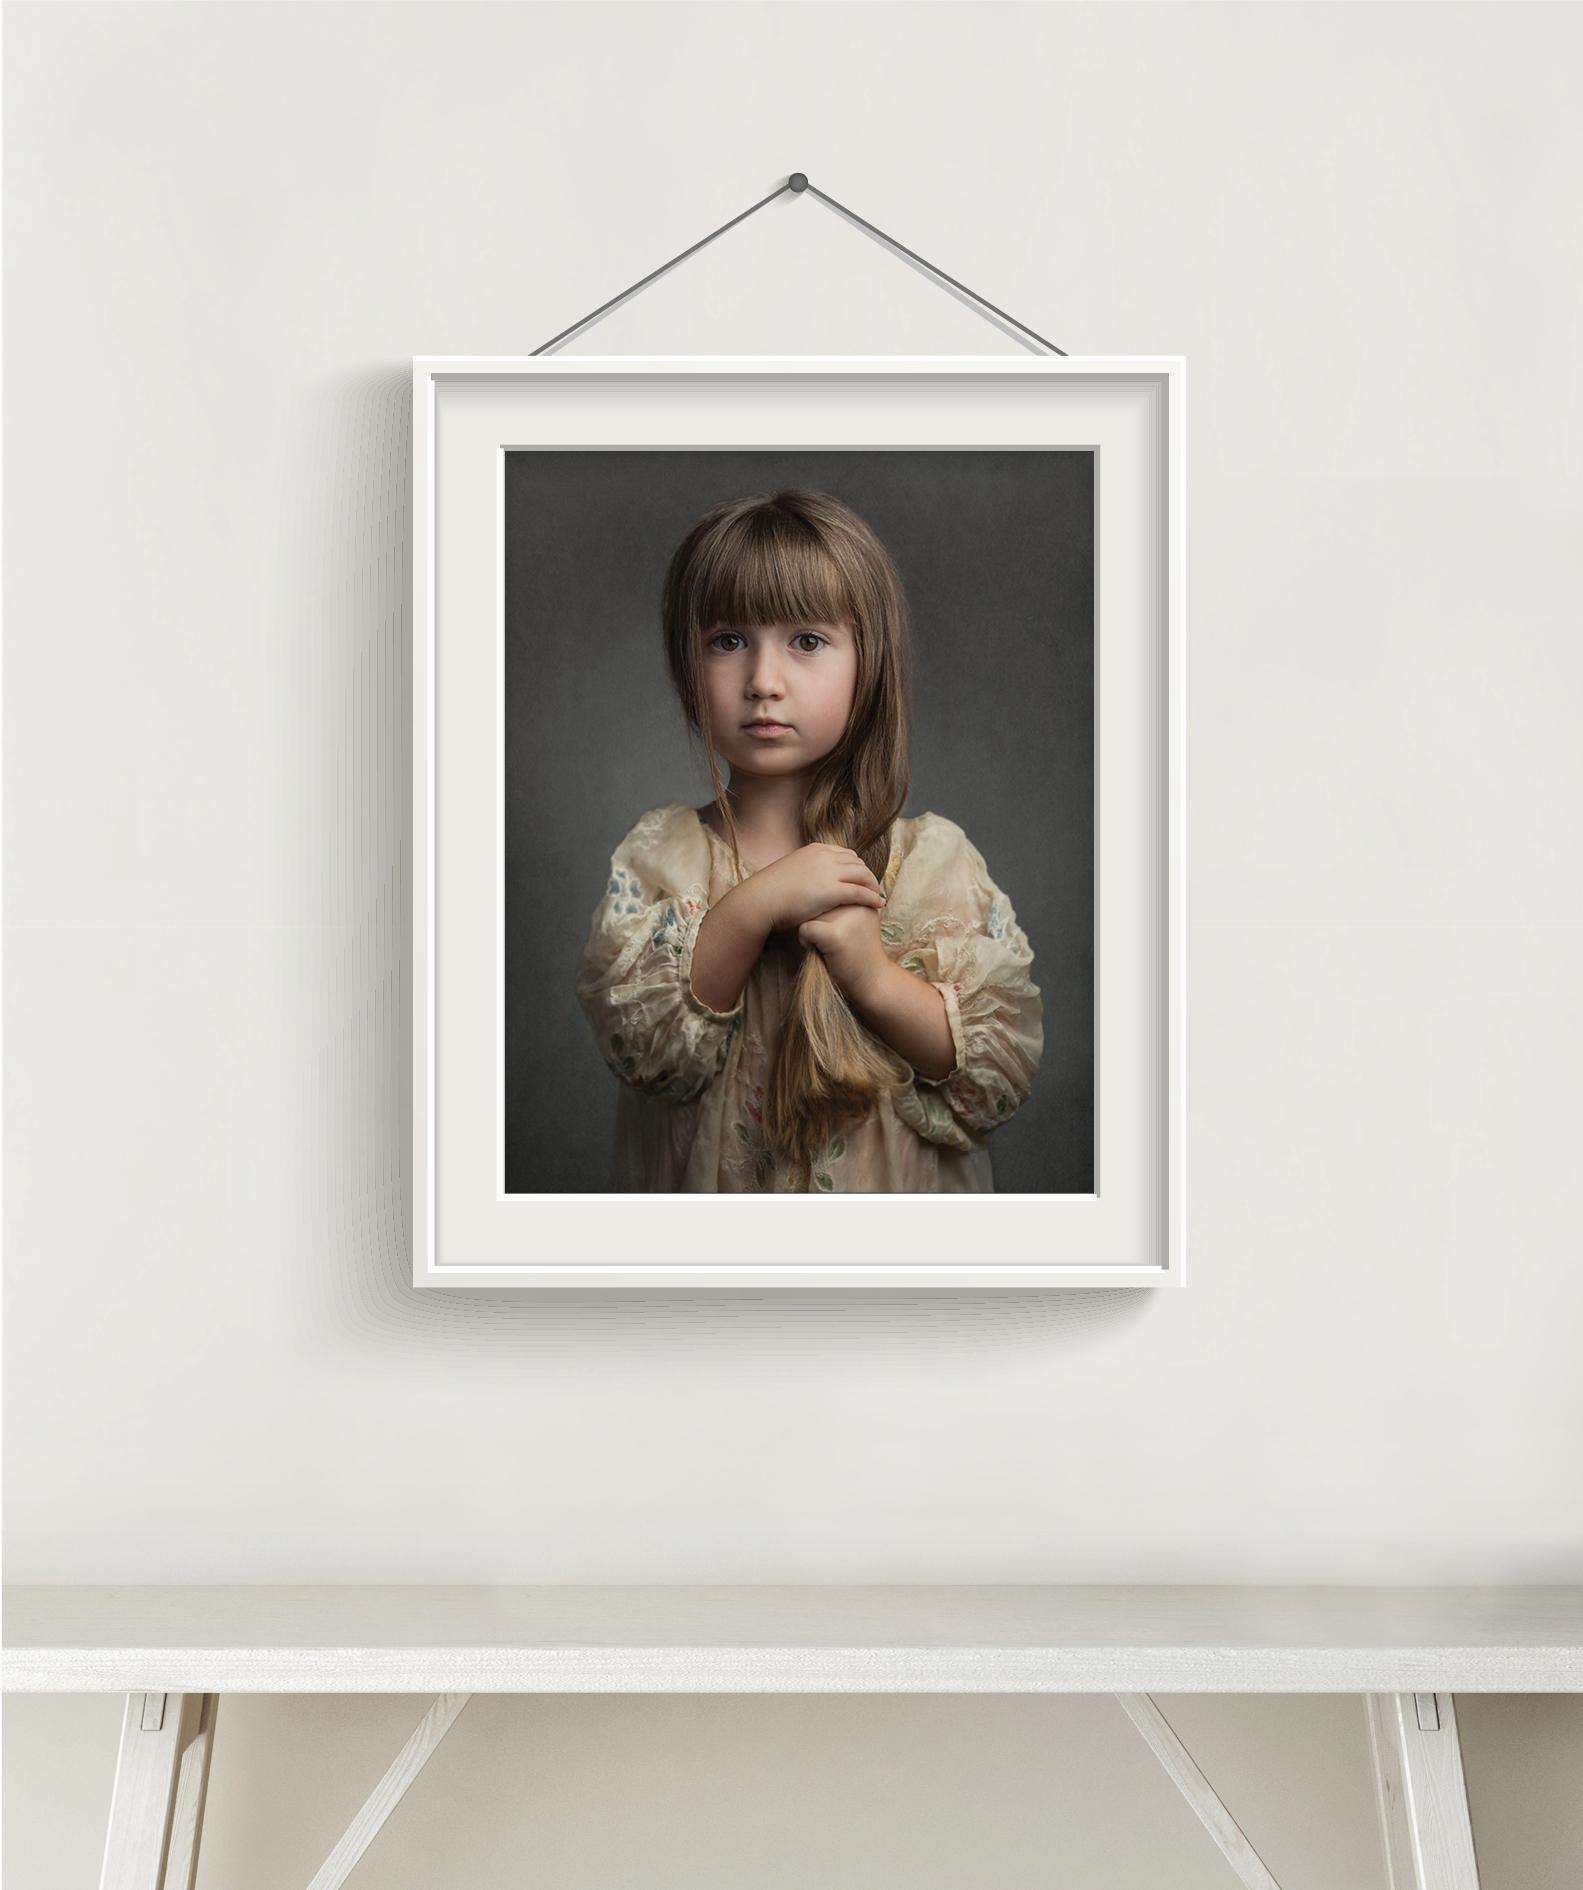 Medium print 305 x 365mm